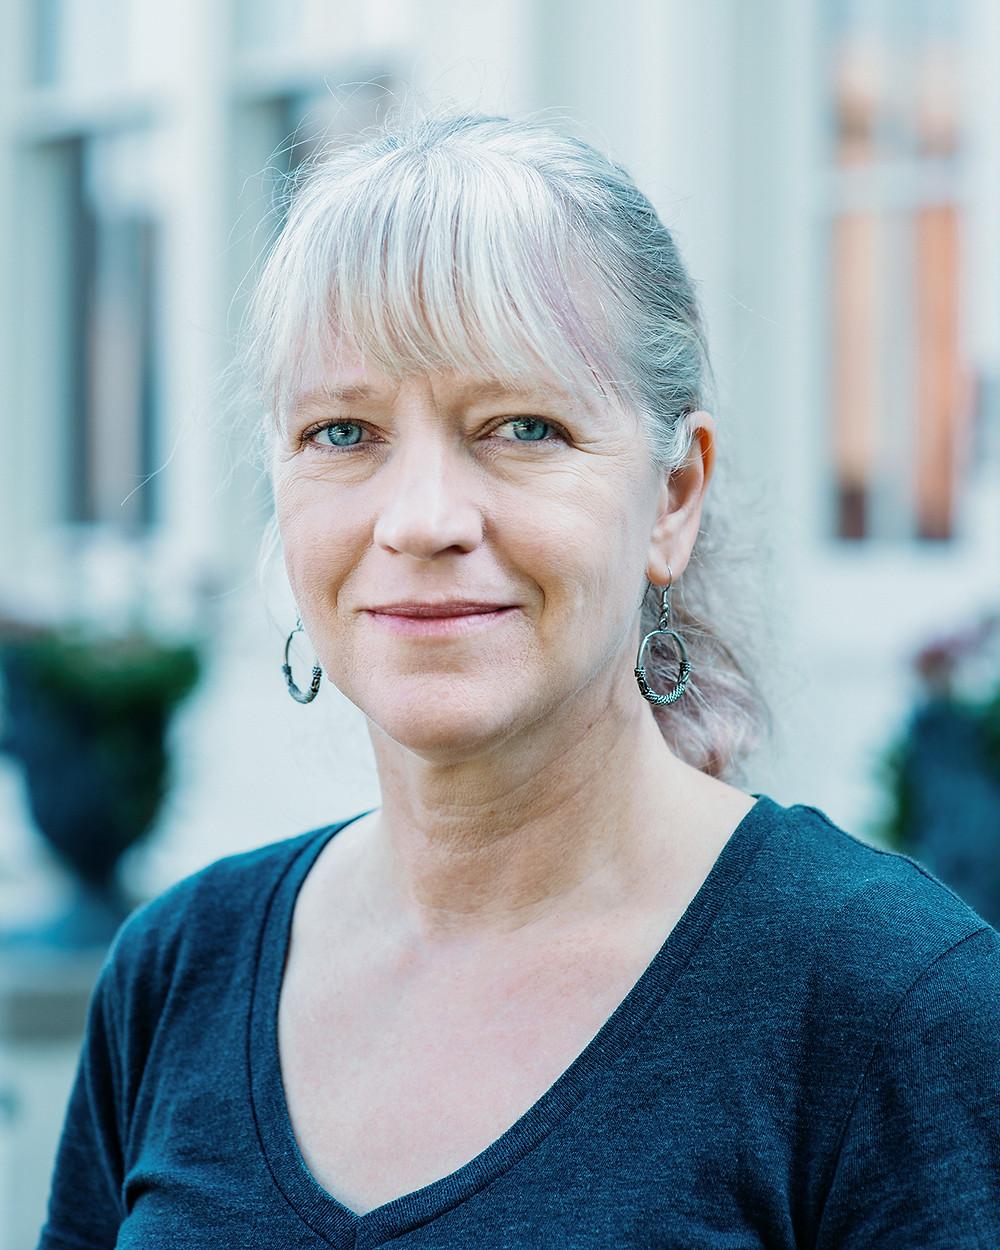 Jeannie Tomlinson Saltmarsh, Metals Shop Coordinator at the Metal Museum